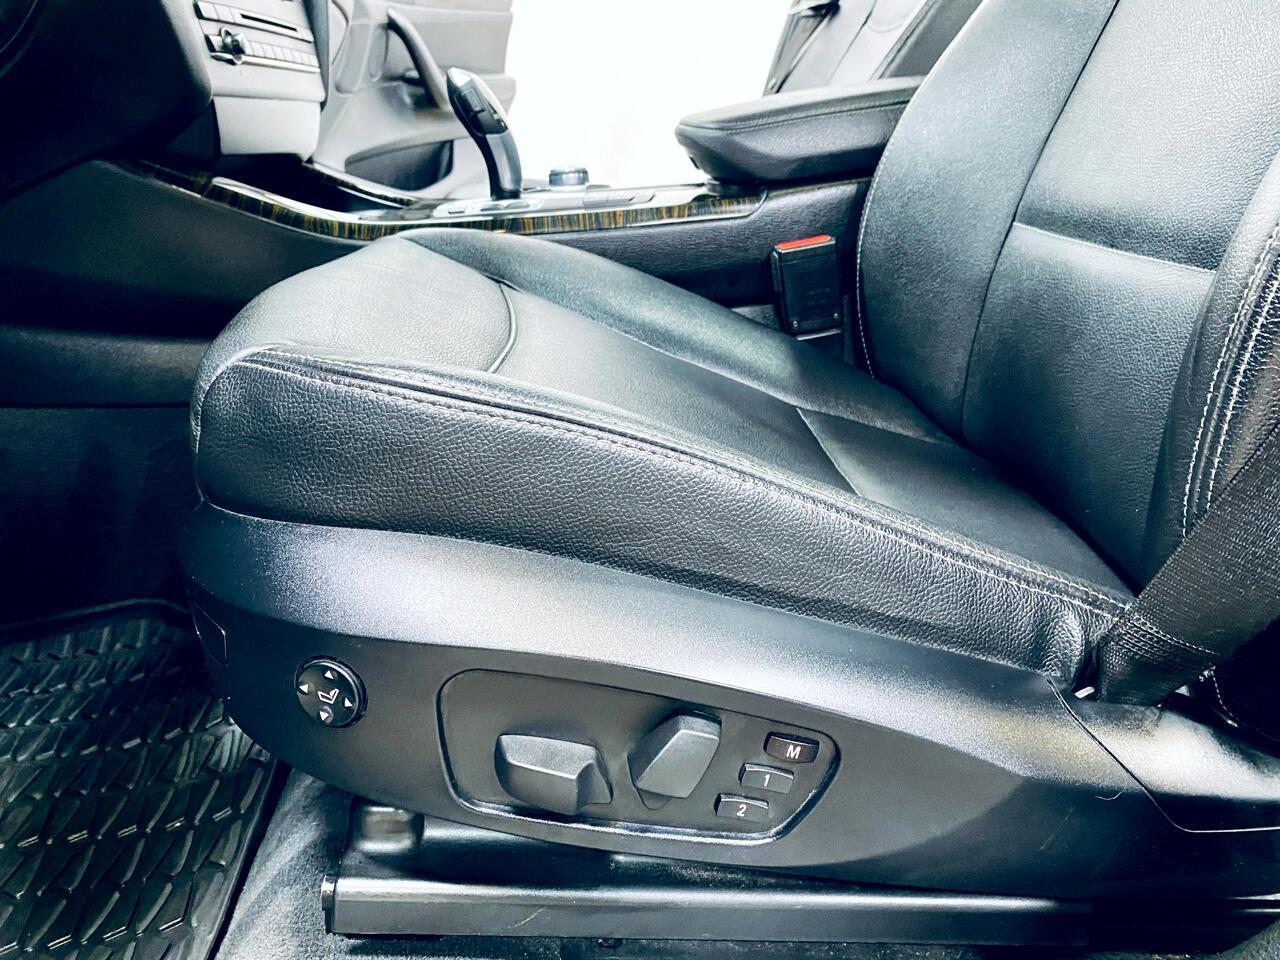 2013 BMW X3 (CC-1360234) for sale in Mooresville, North Carolina